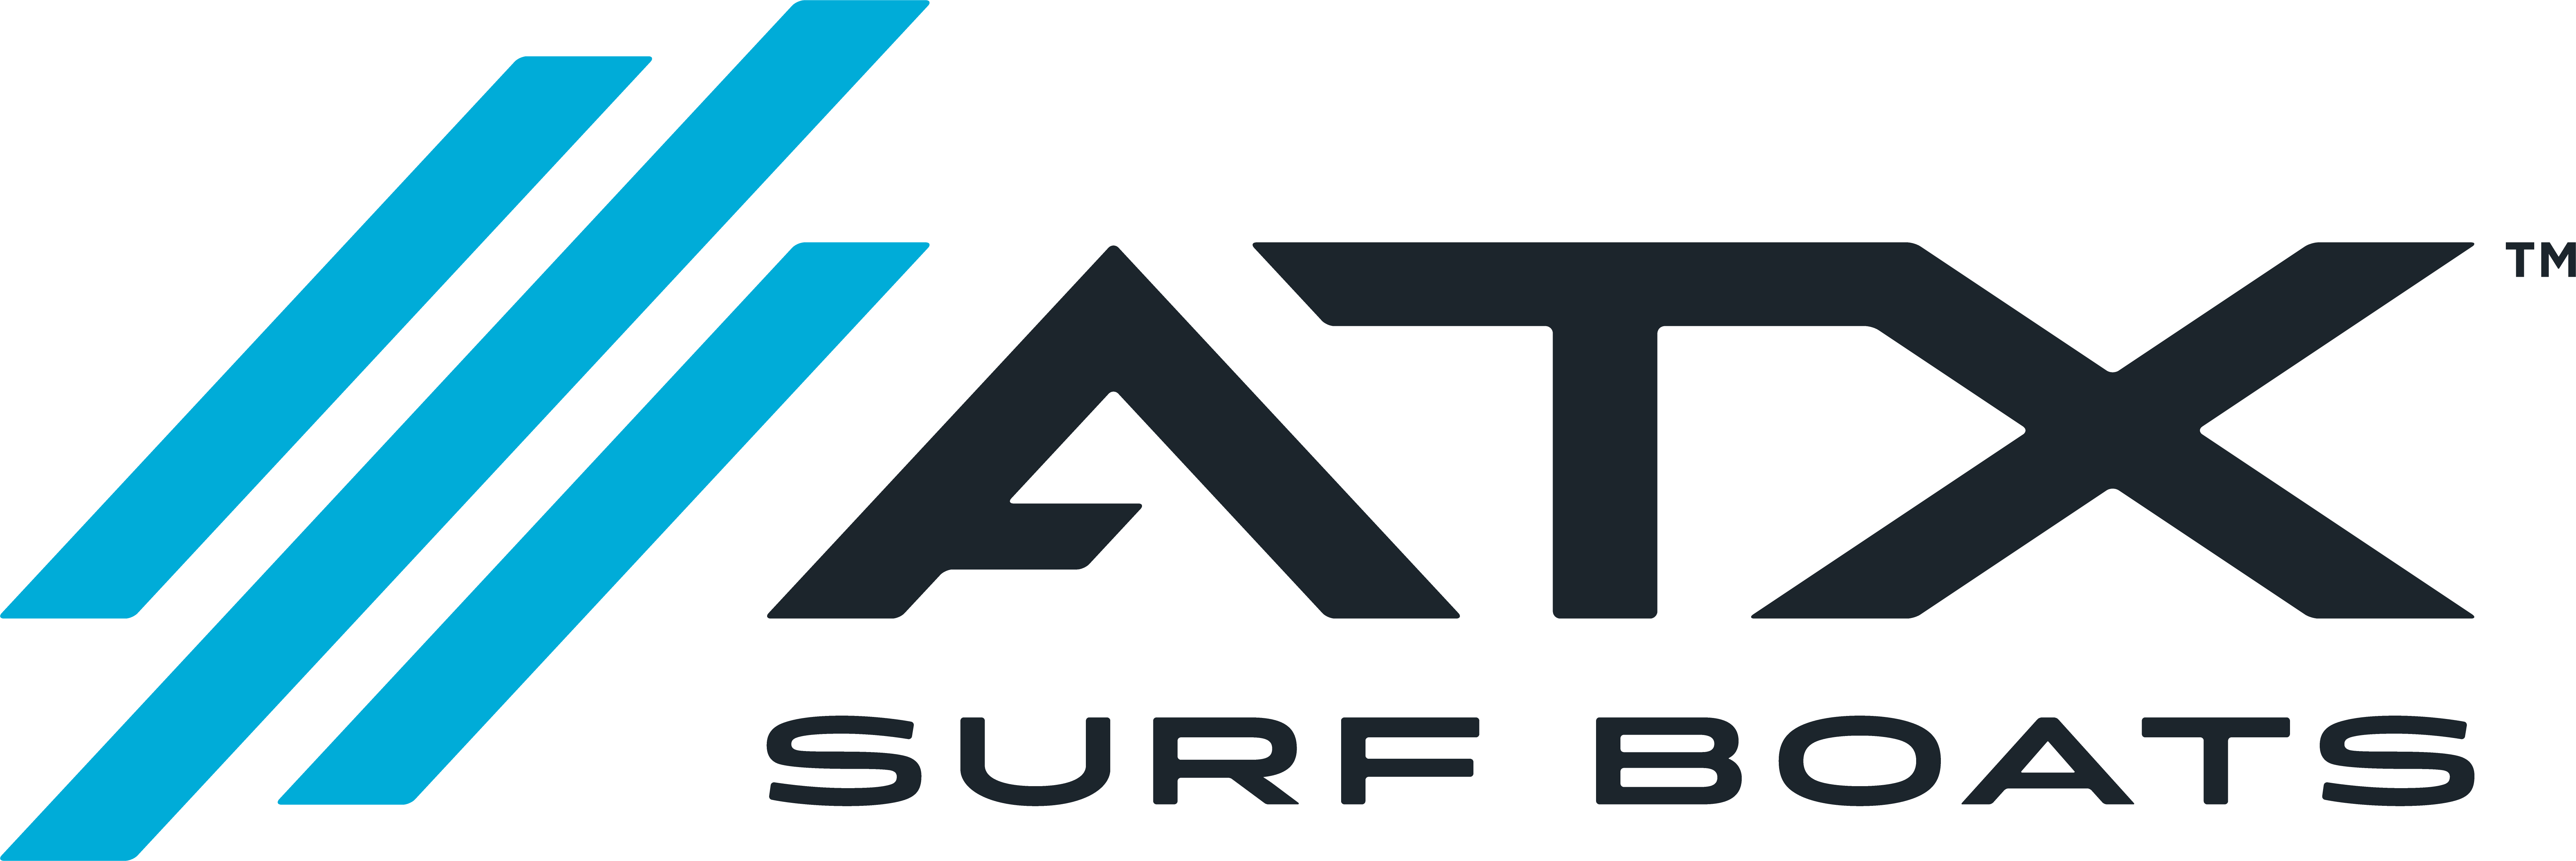 ATX Surf Boats brand logo